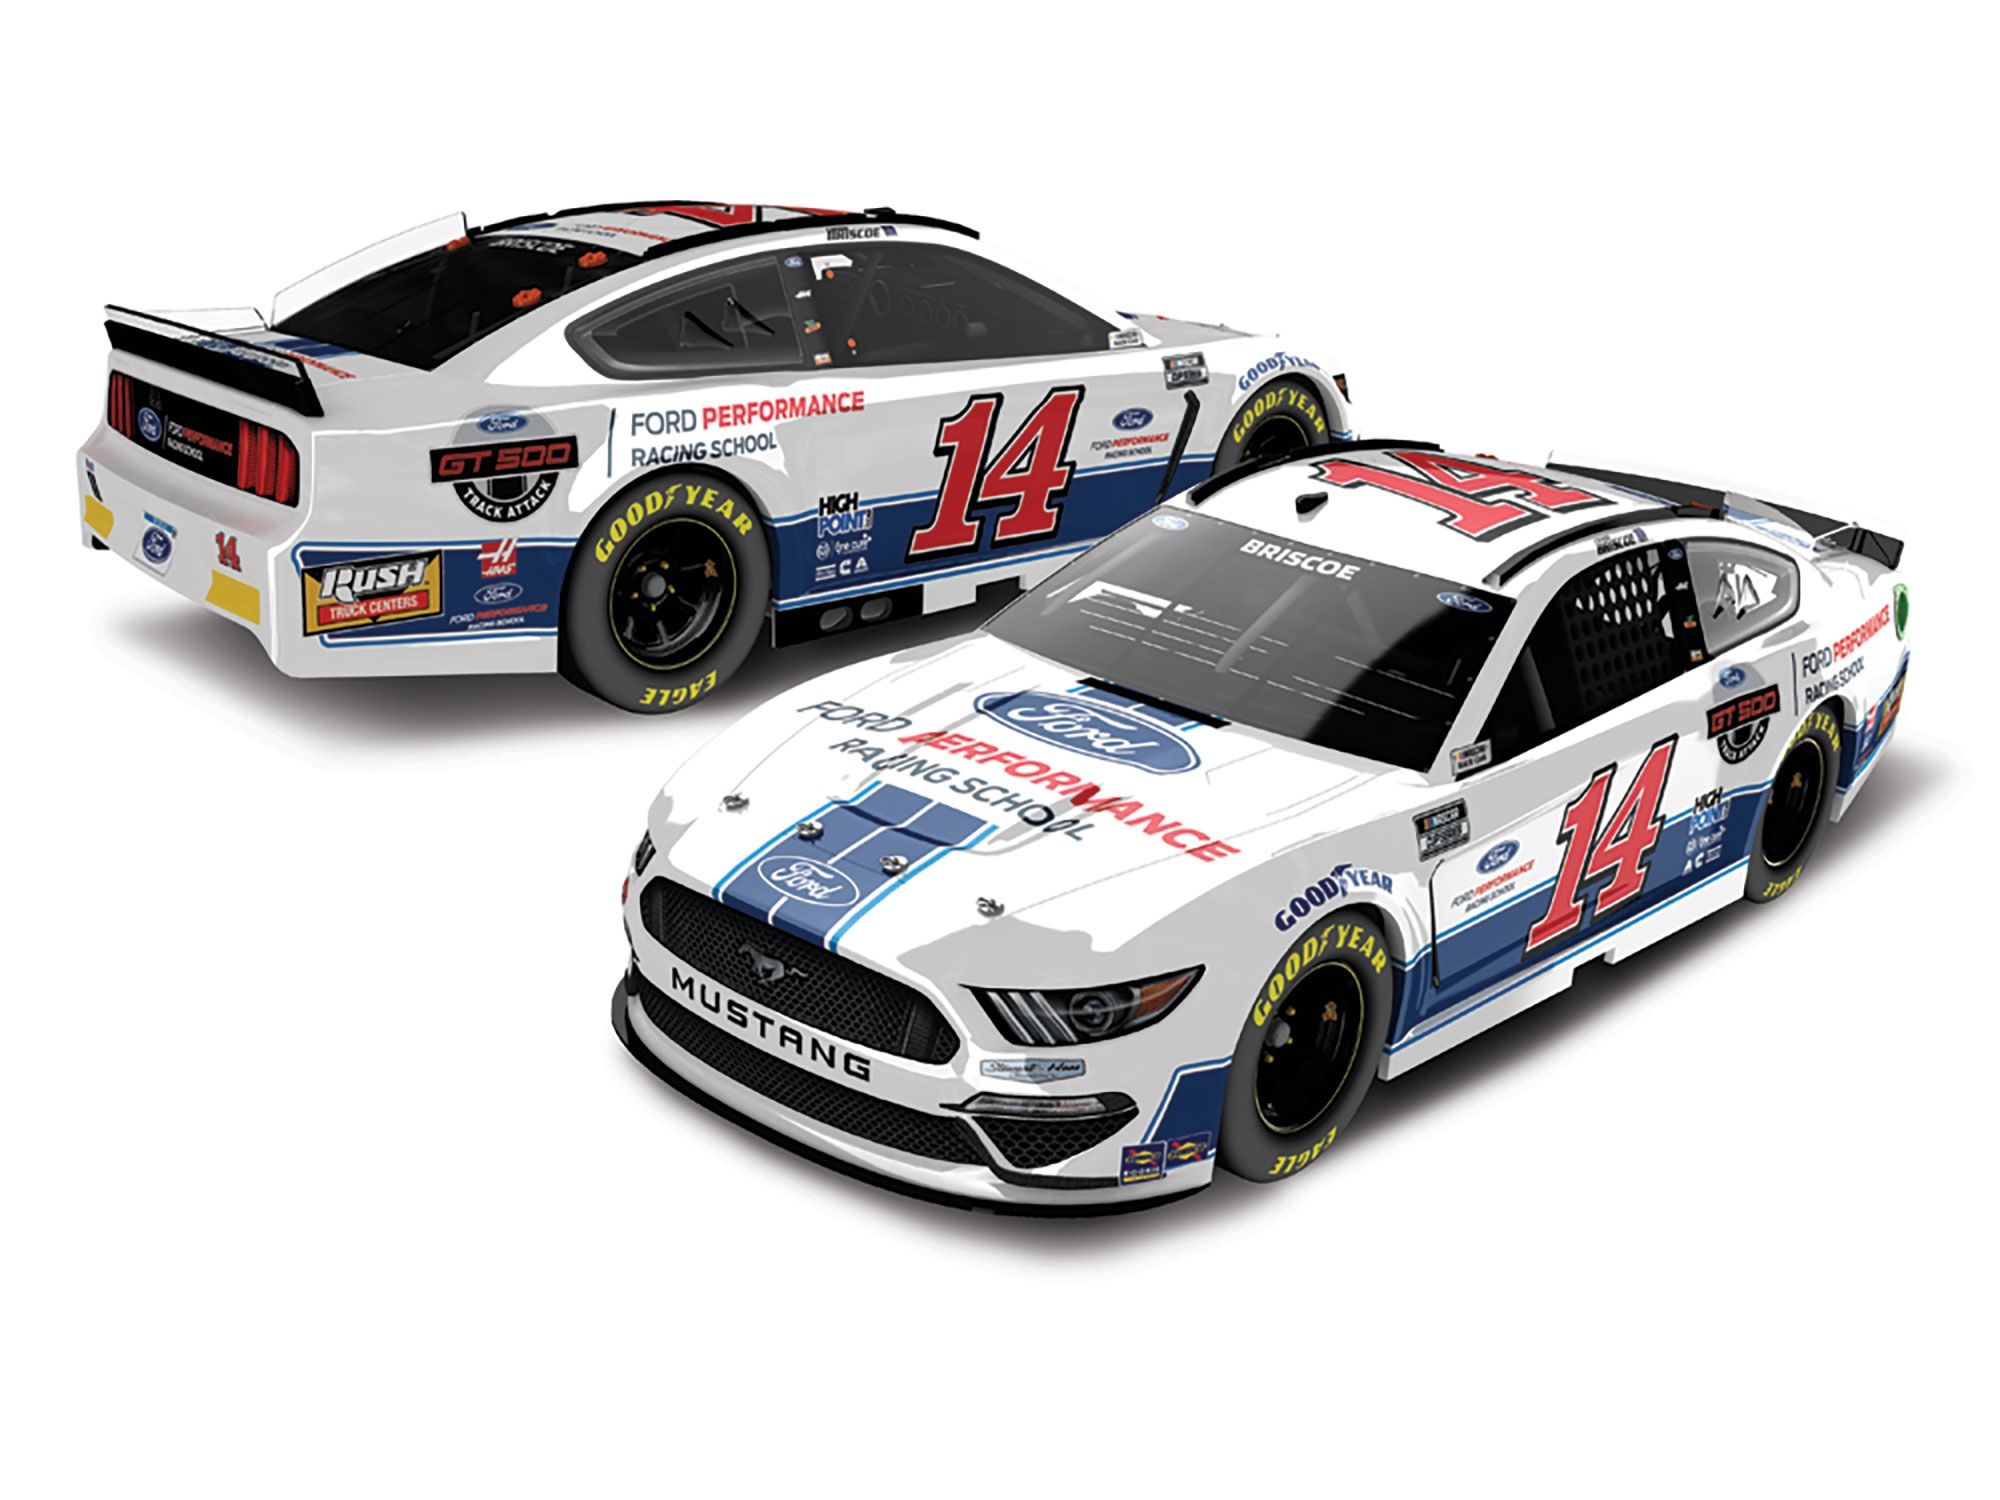 Tyler Reddick 2018 Chevrolet Camaro Burgerfi NASCAR Diecast 1: 24 Scale Lionel Racing